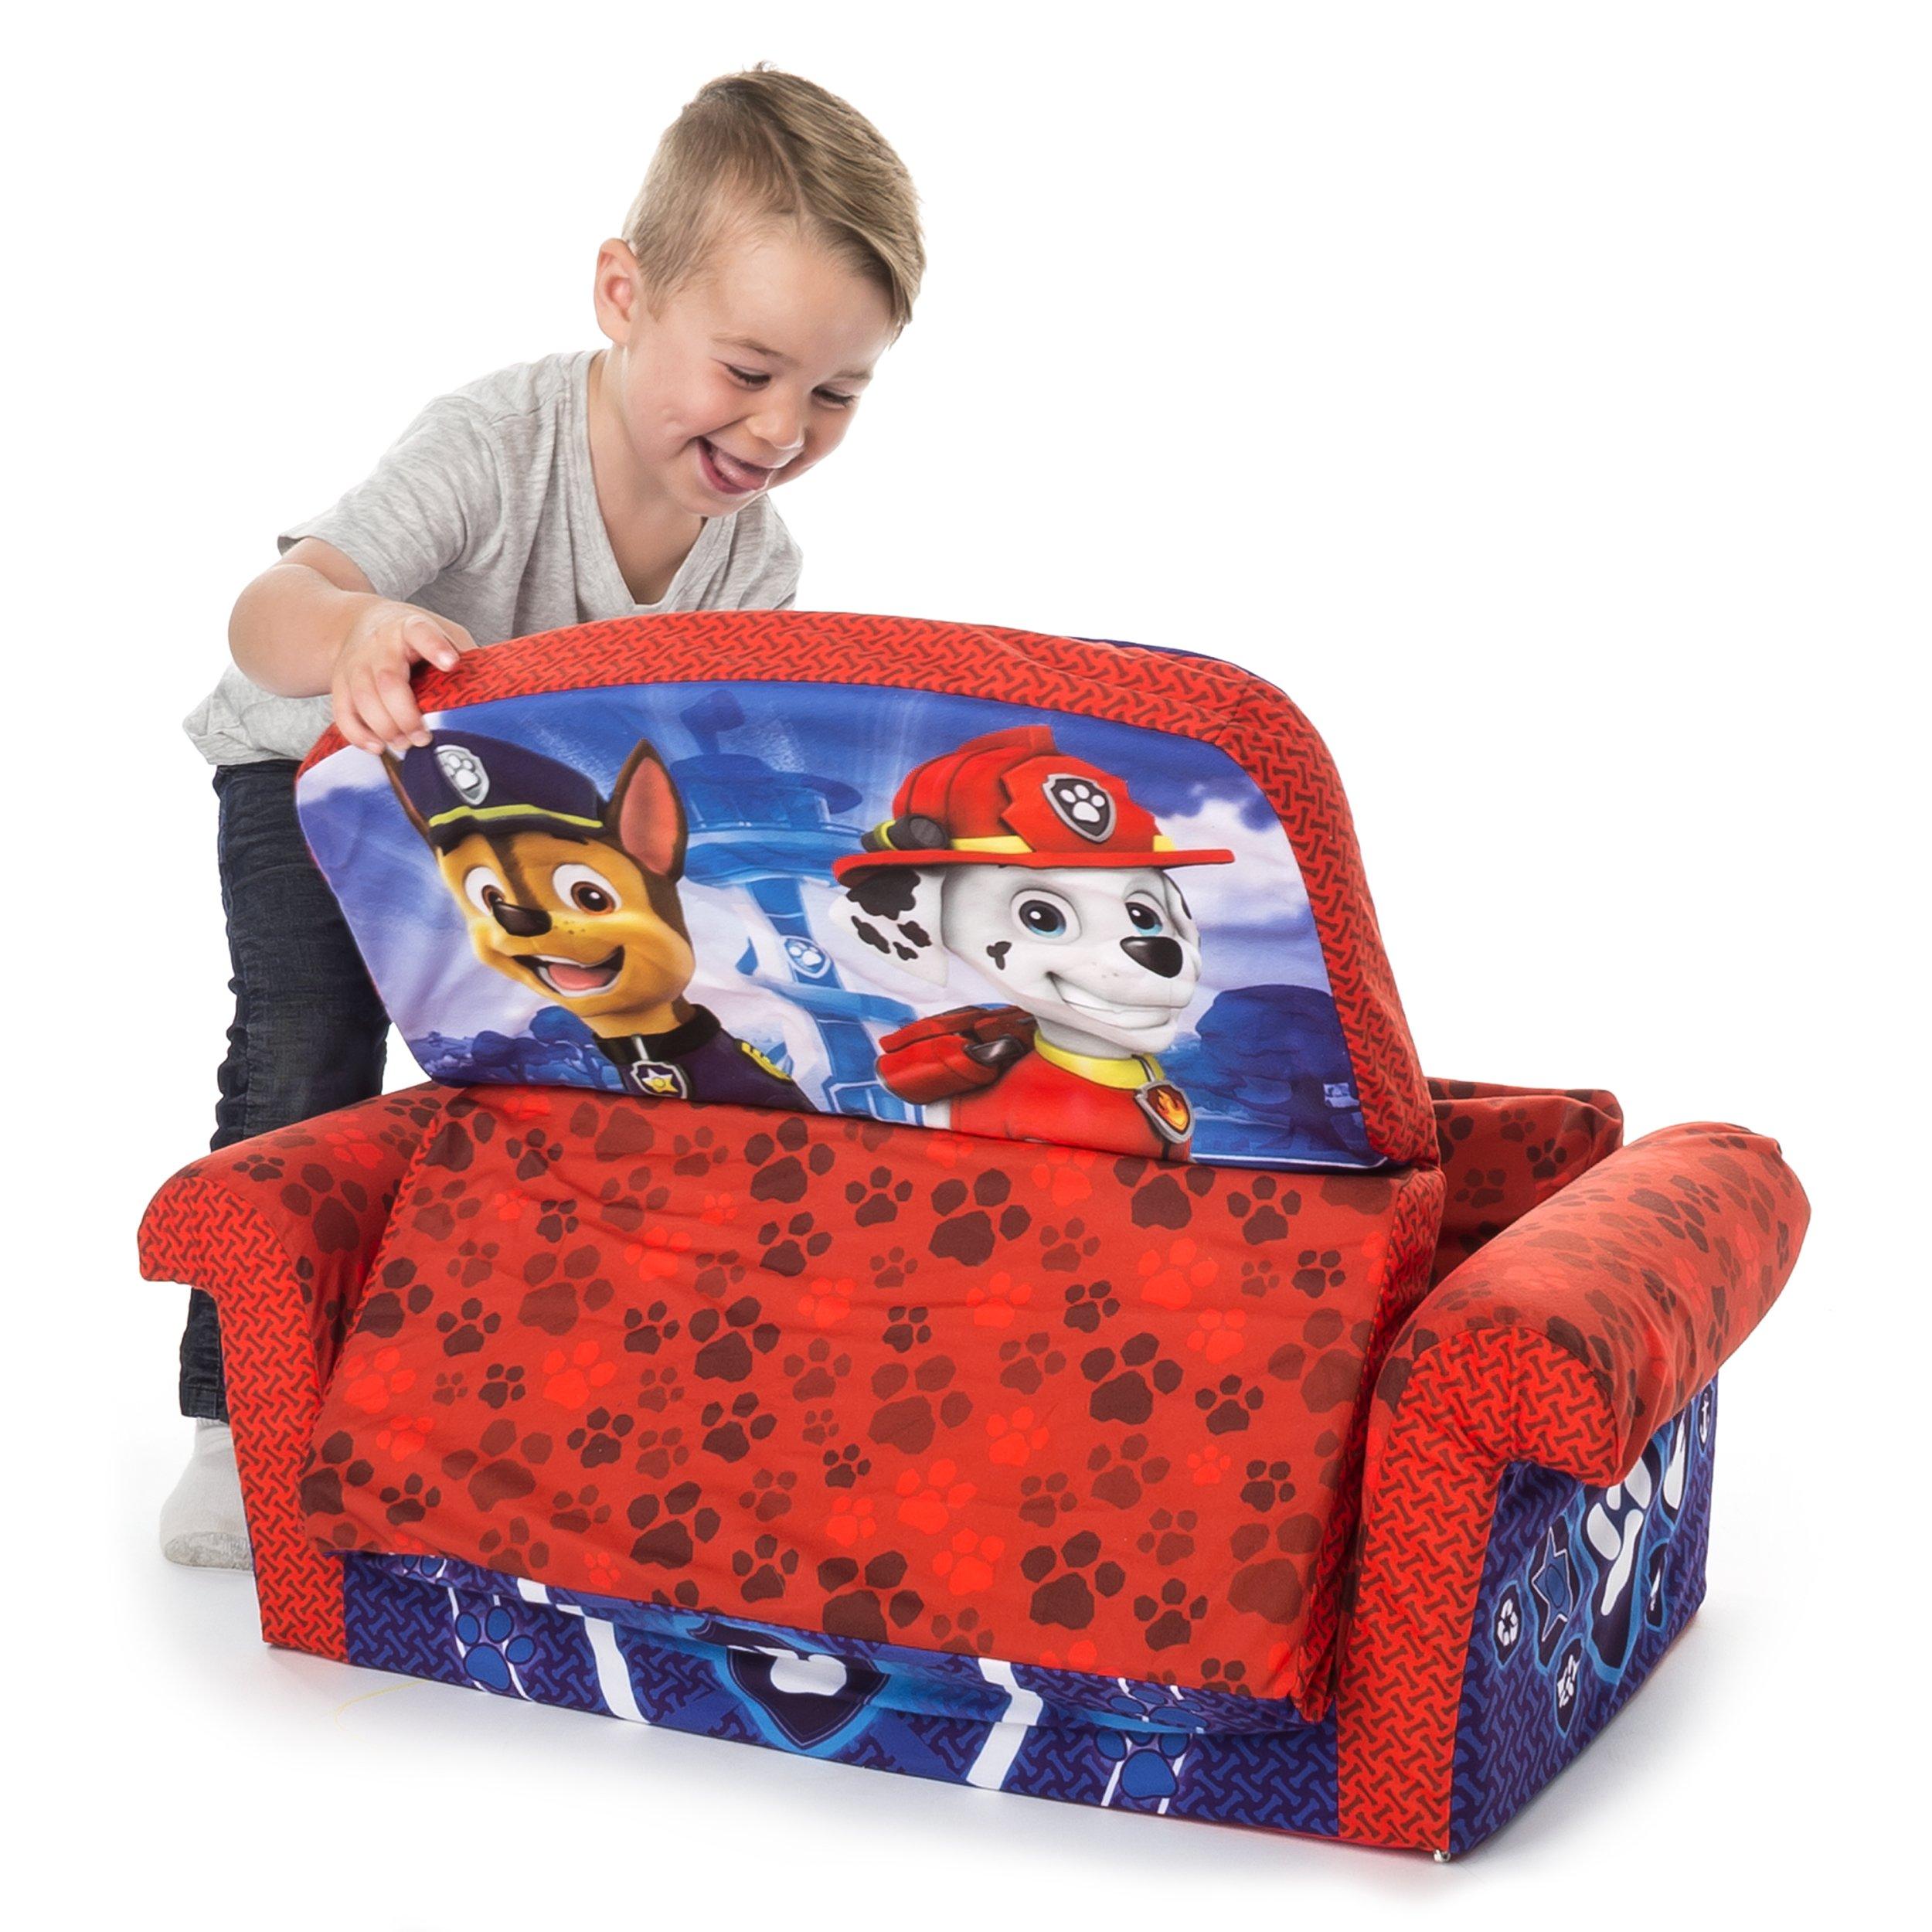 Marshmallow Furniture Children's 2 in 1 Flip Open Foam, Nickelodeon Paw Patrol Sofa Chair Furniture, Red by Marshmallow Furniture (Image #3)